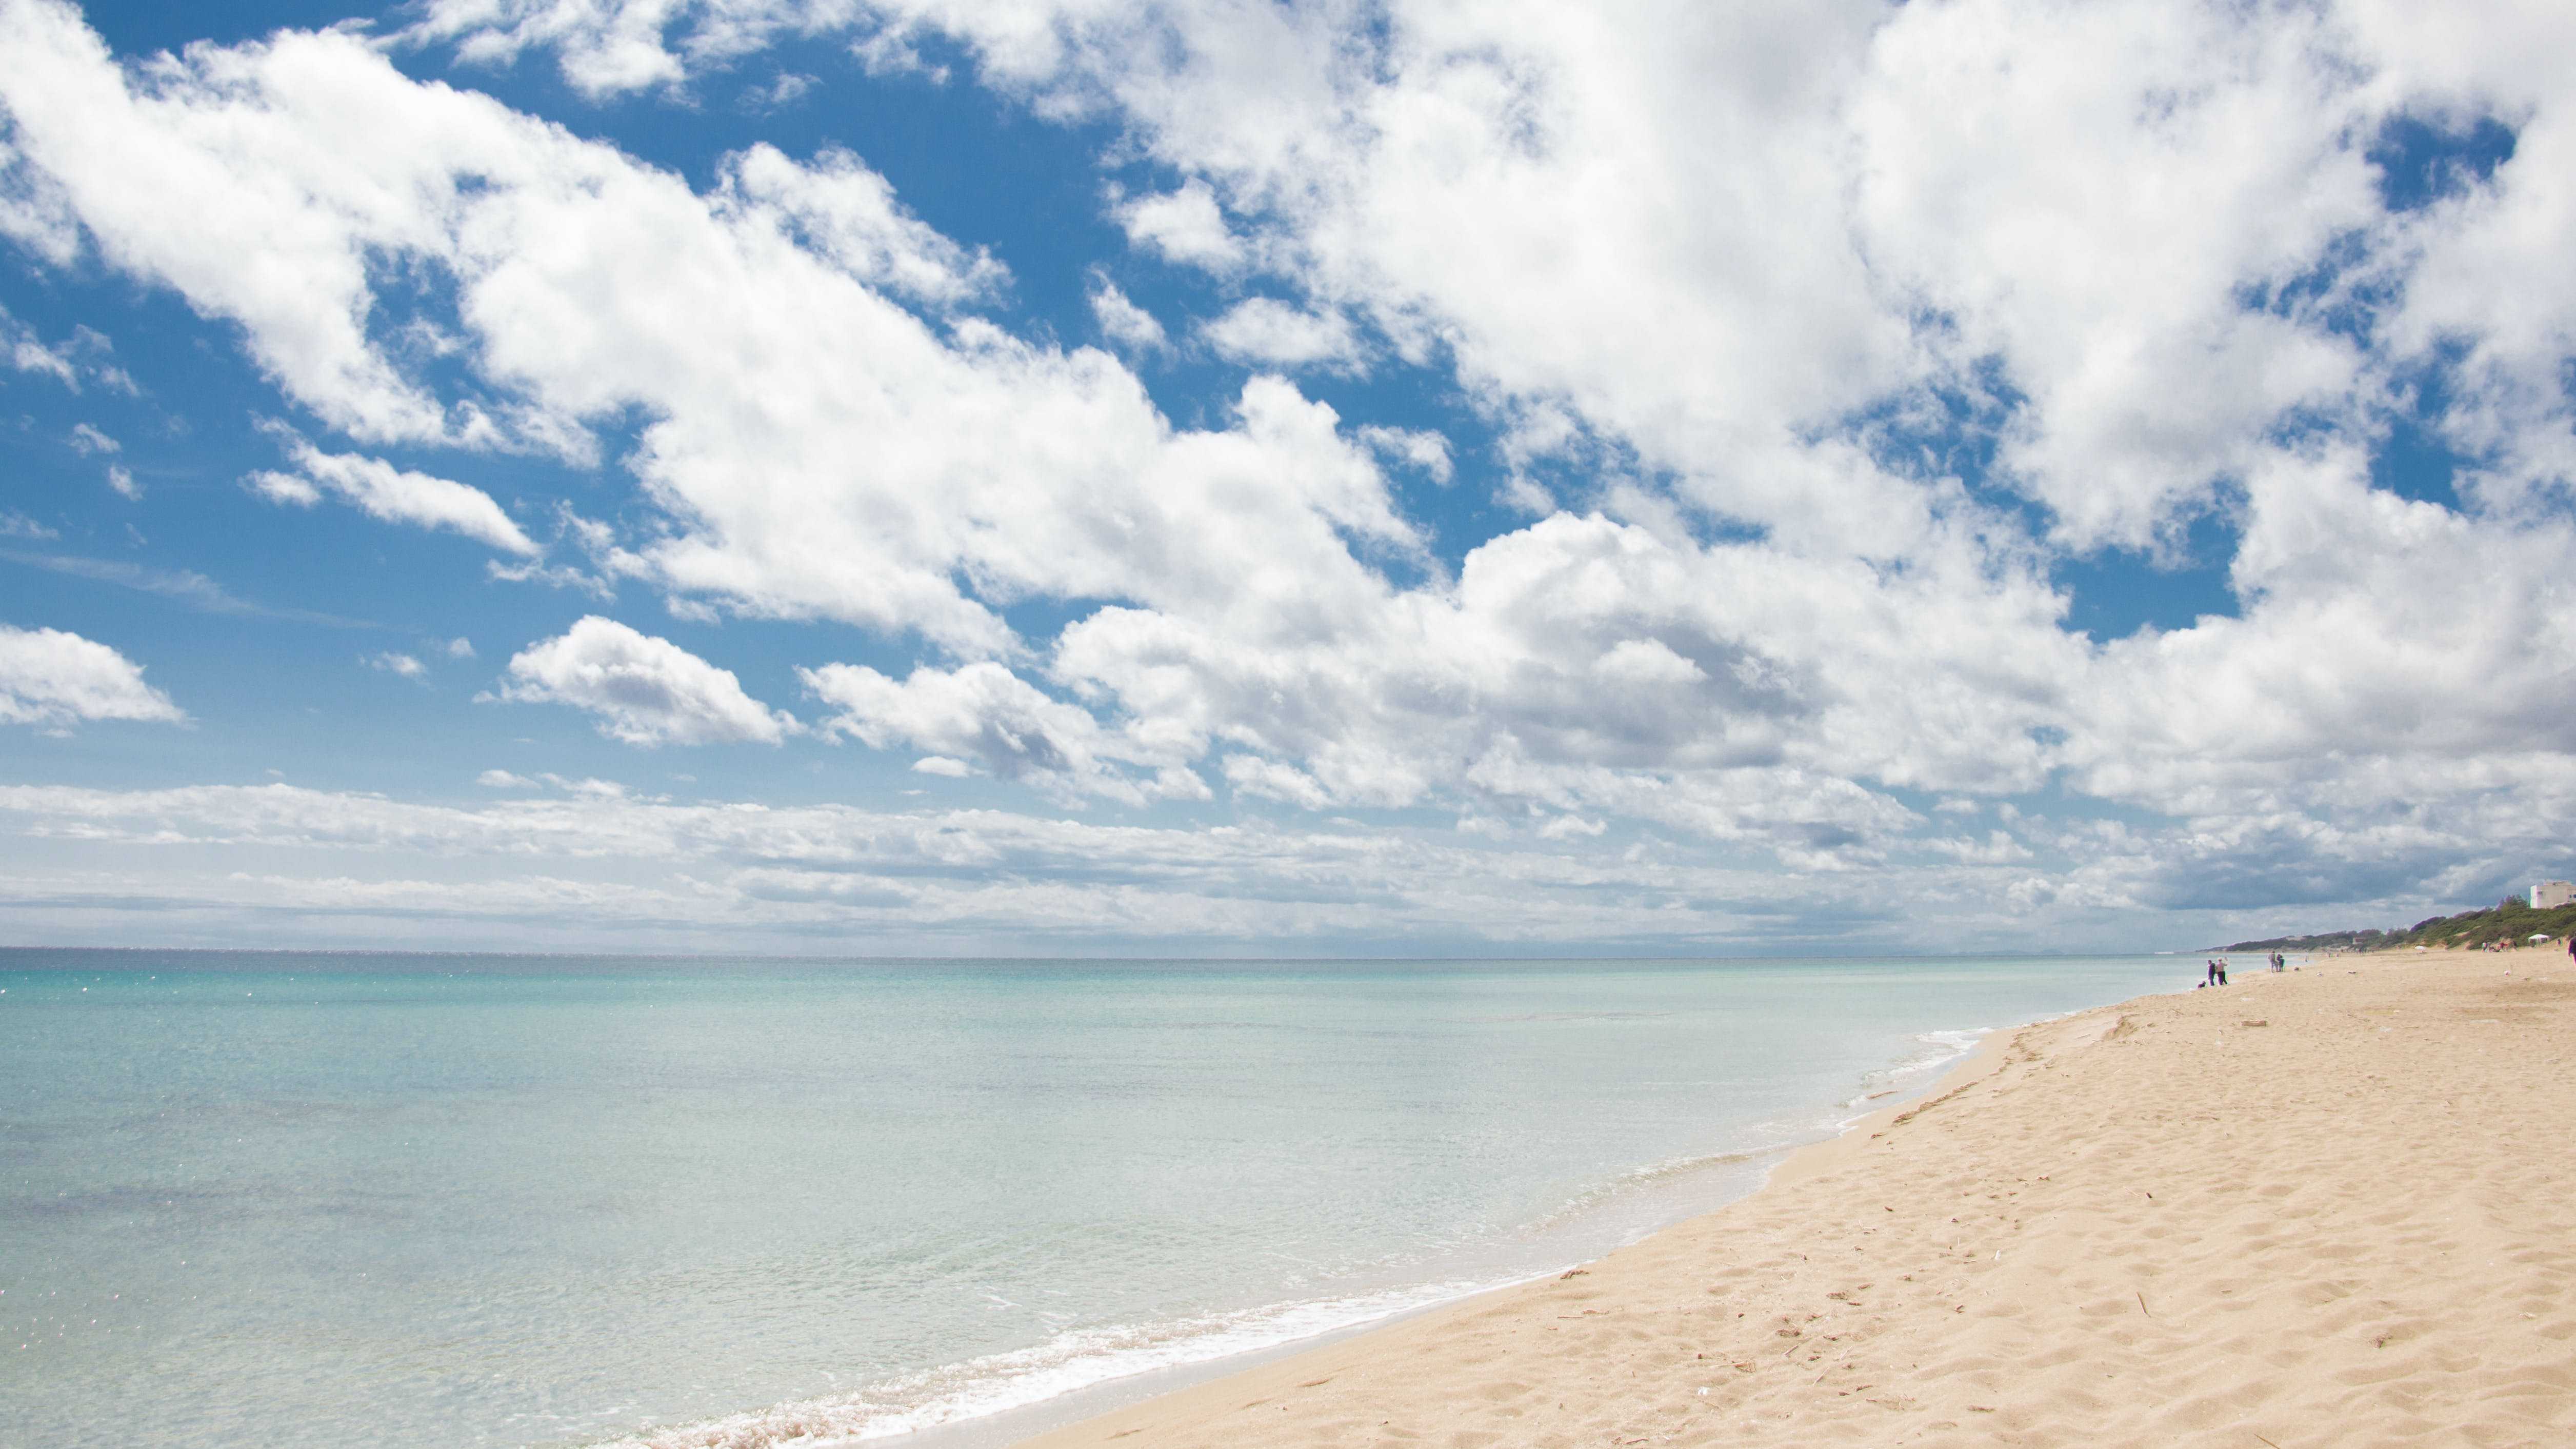 Panoramic Photography of White Sand Beach